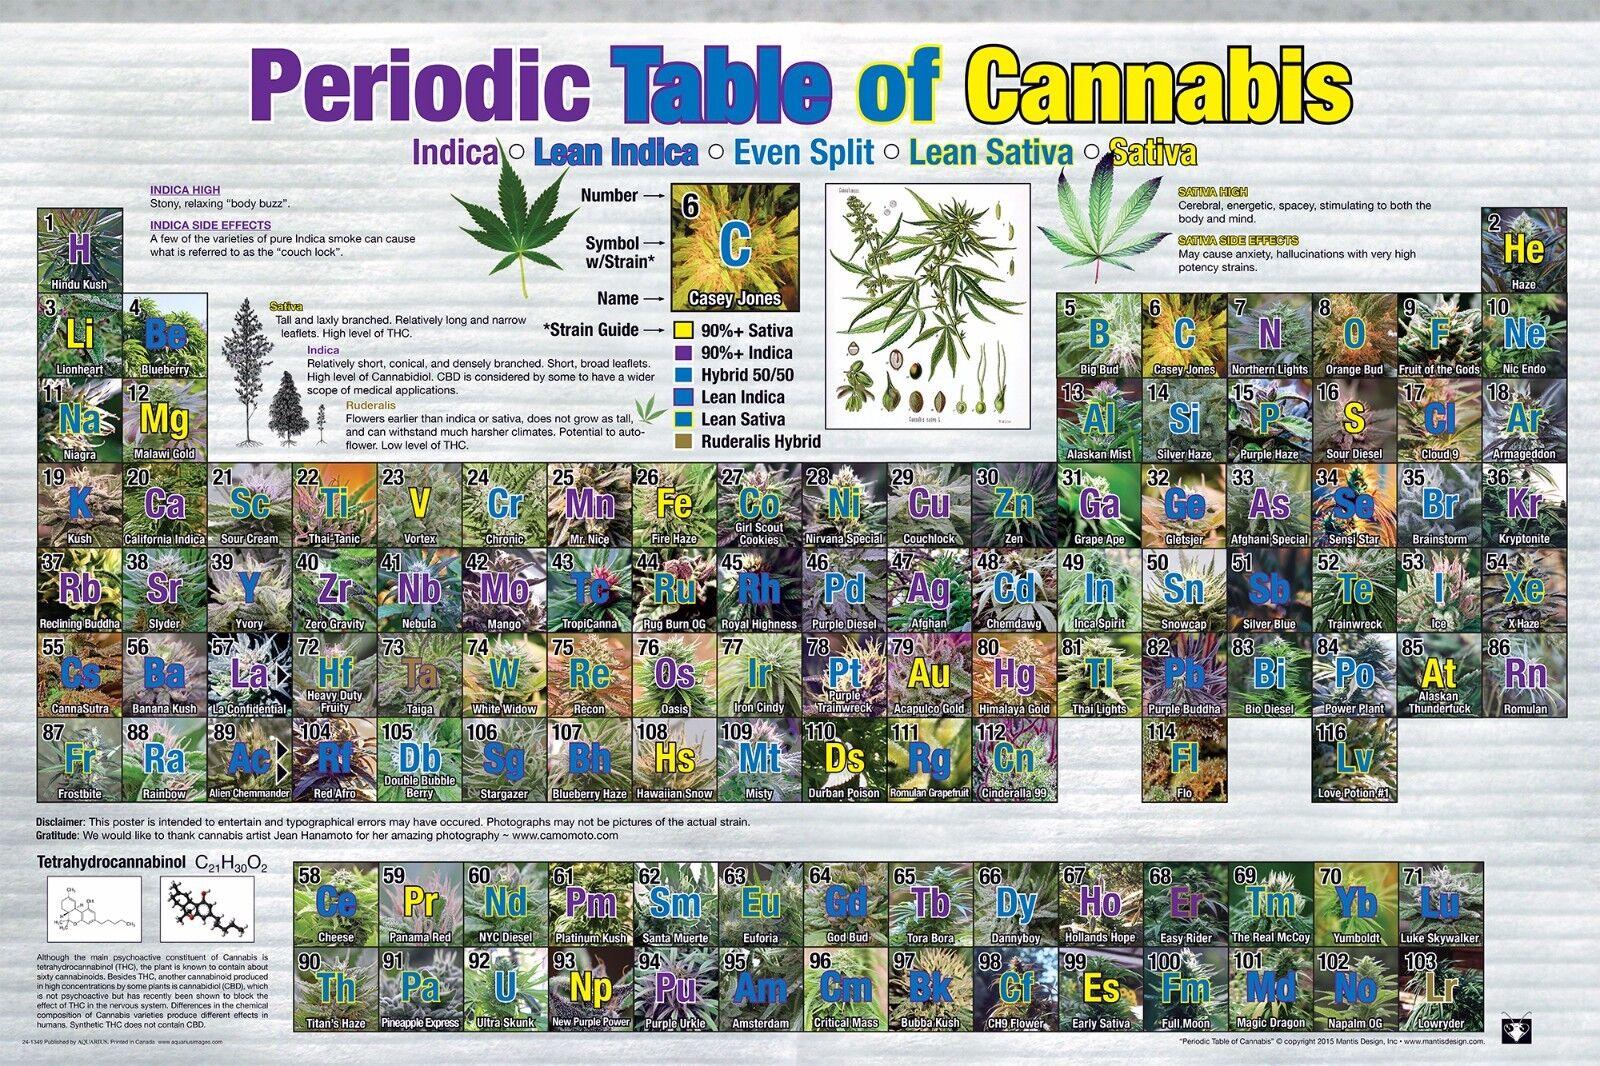 PERIODIC TABLE OF CANNABIS POSTER - 24x36 WEED POT MARIJUANA CHART LIST 241349